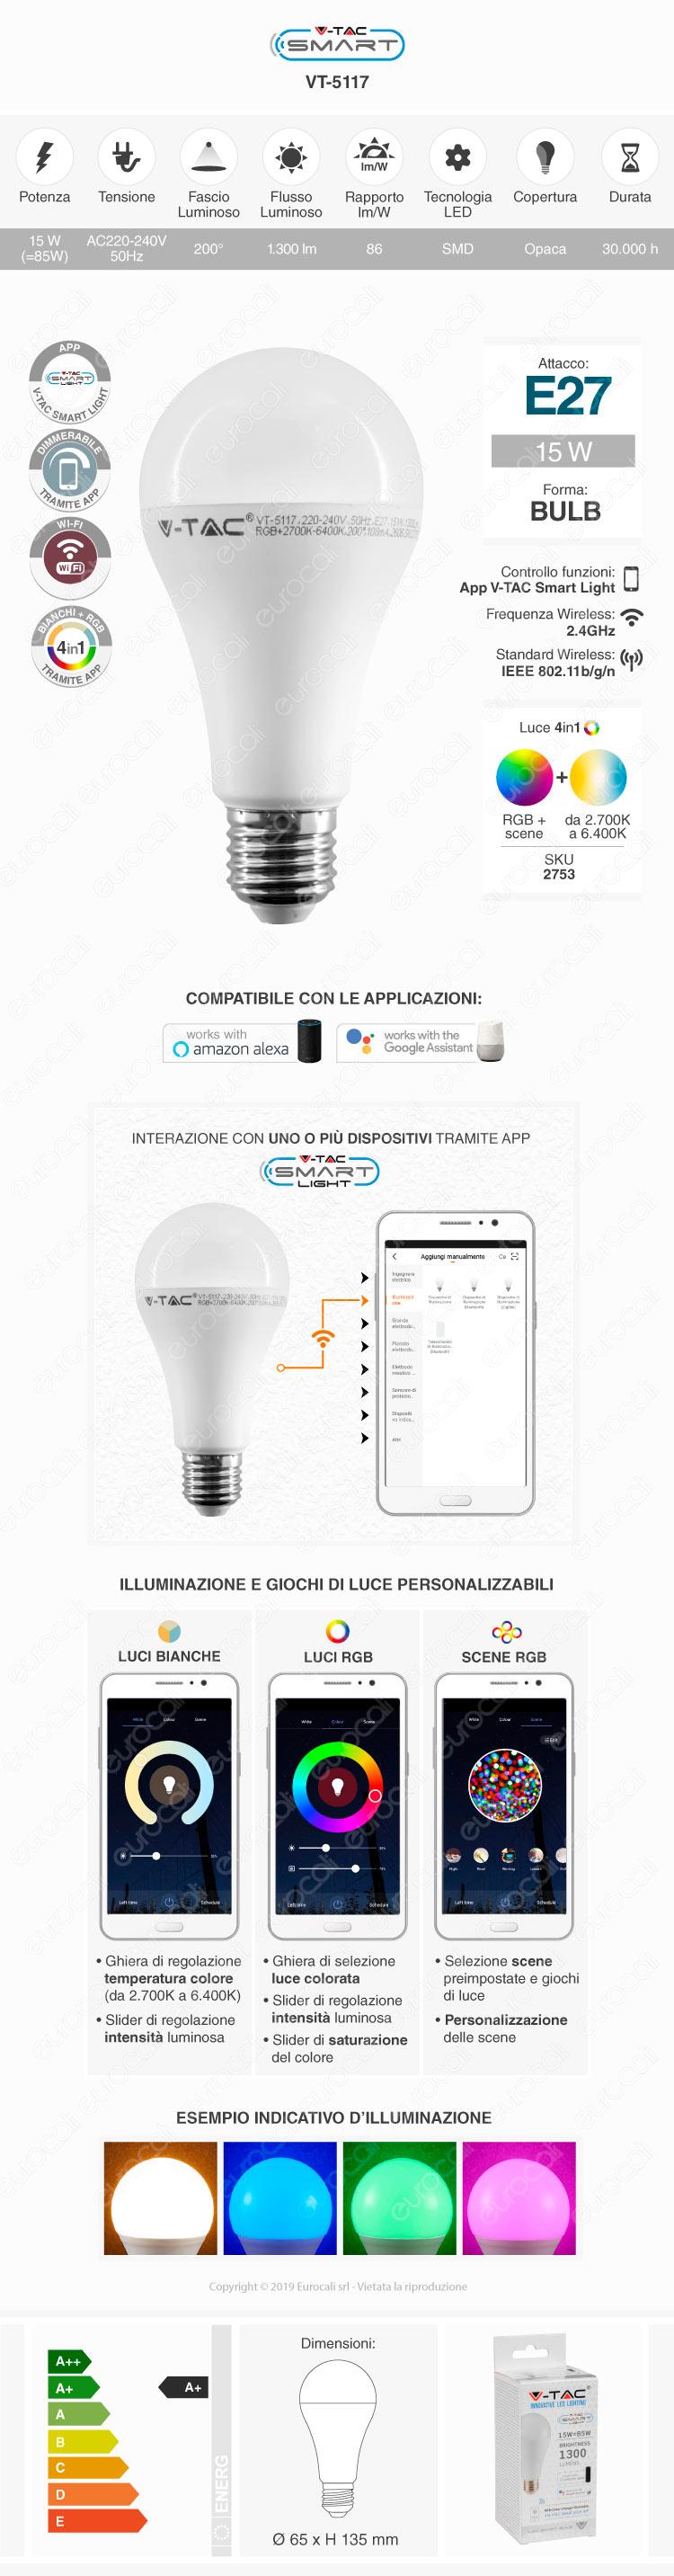 V-Tac Smart VT-5117 Lampadina LED Wi-Fi E27 15W Bulb A65 RGB+W Dimmerabile